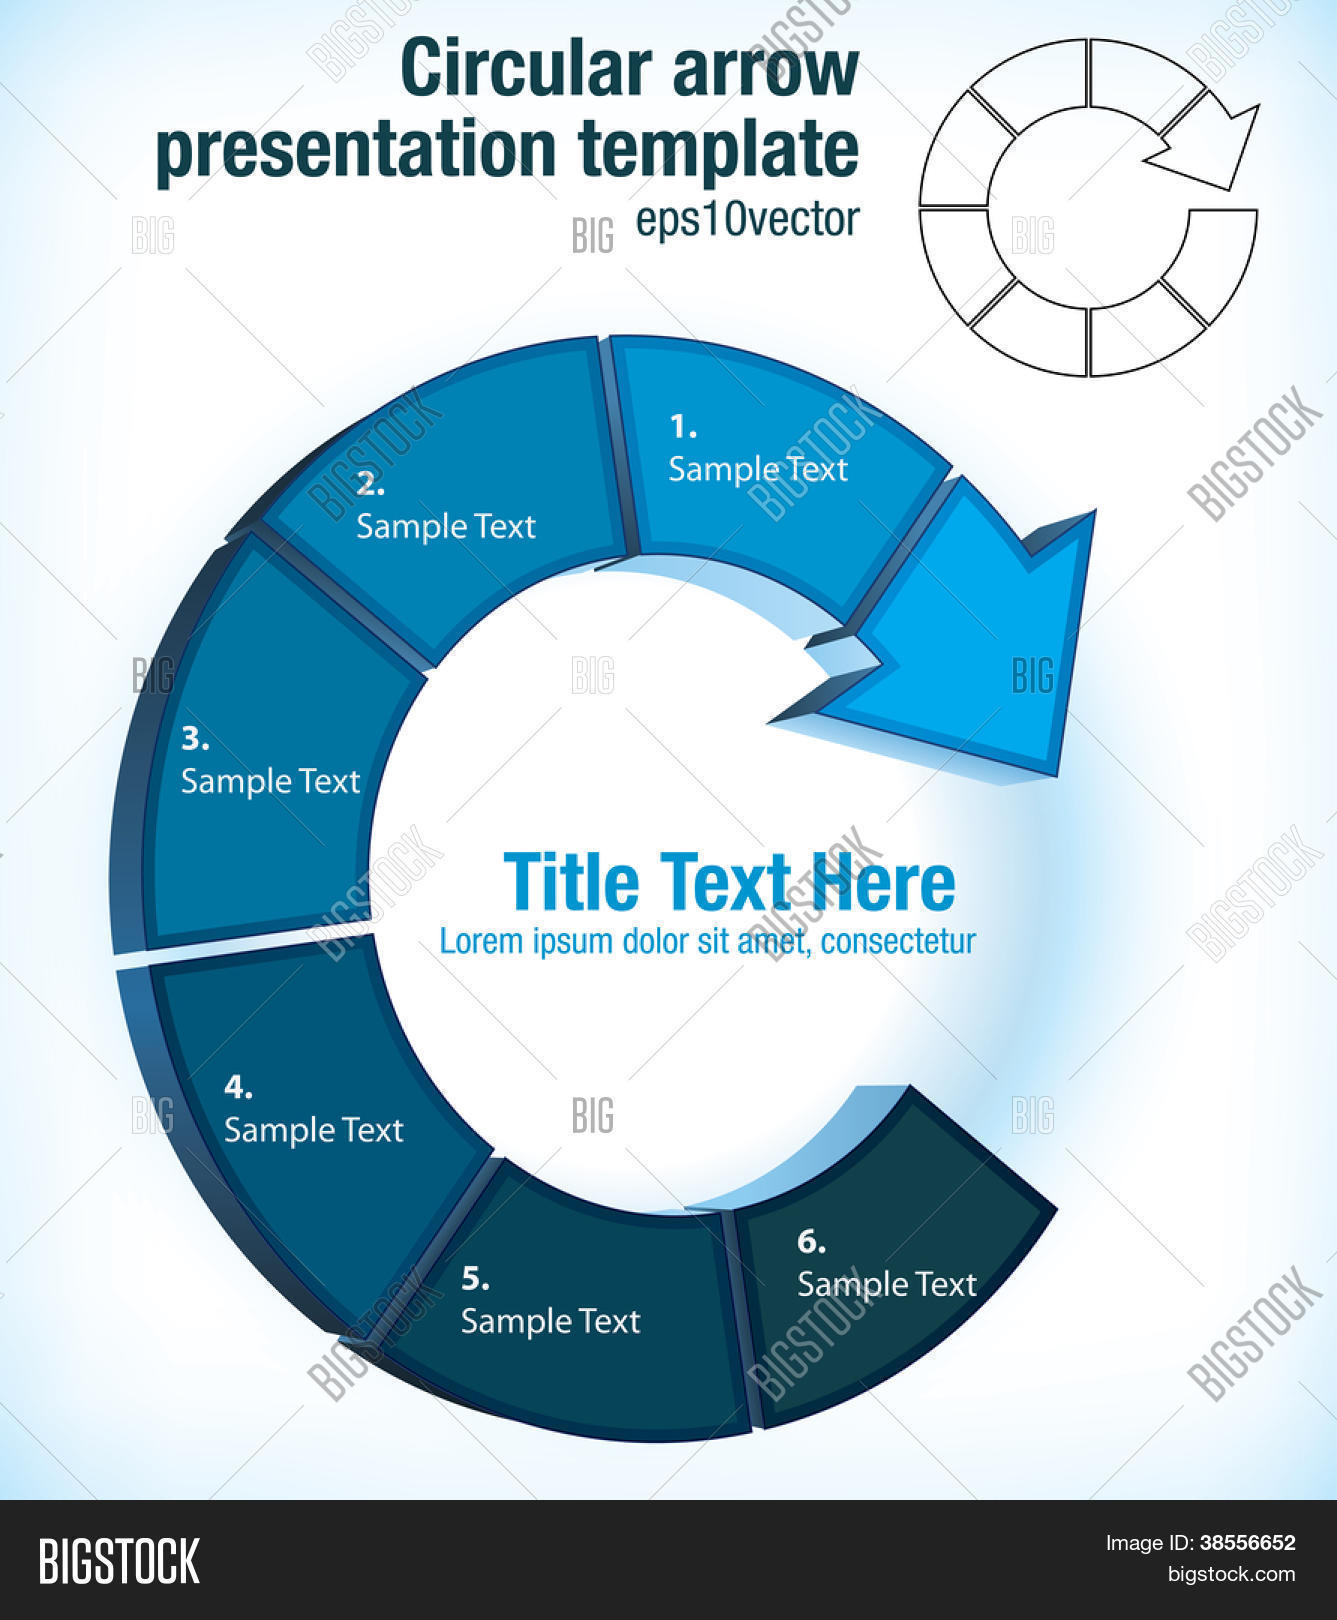 3 arrow circle diagram minn kota wiring trolling motor modele presentation organigramme document online